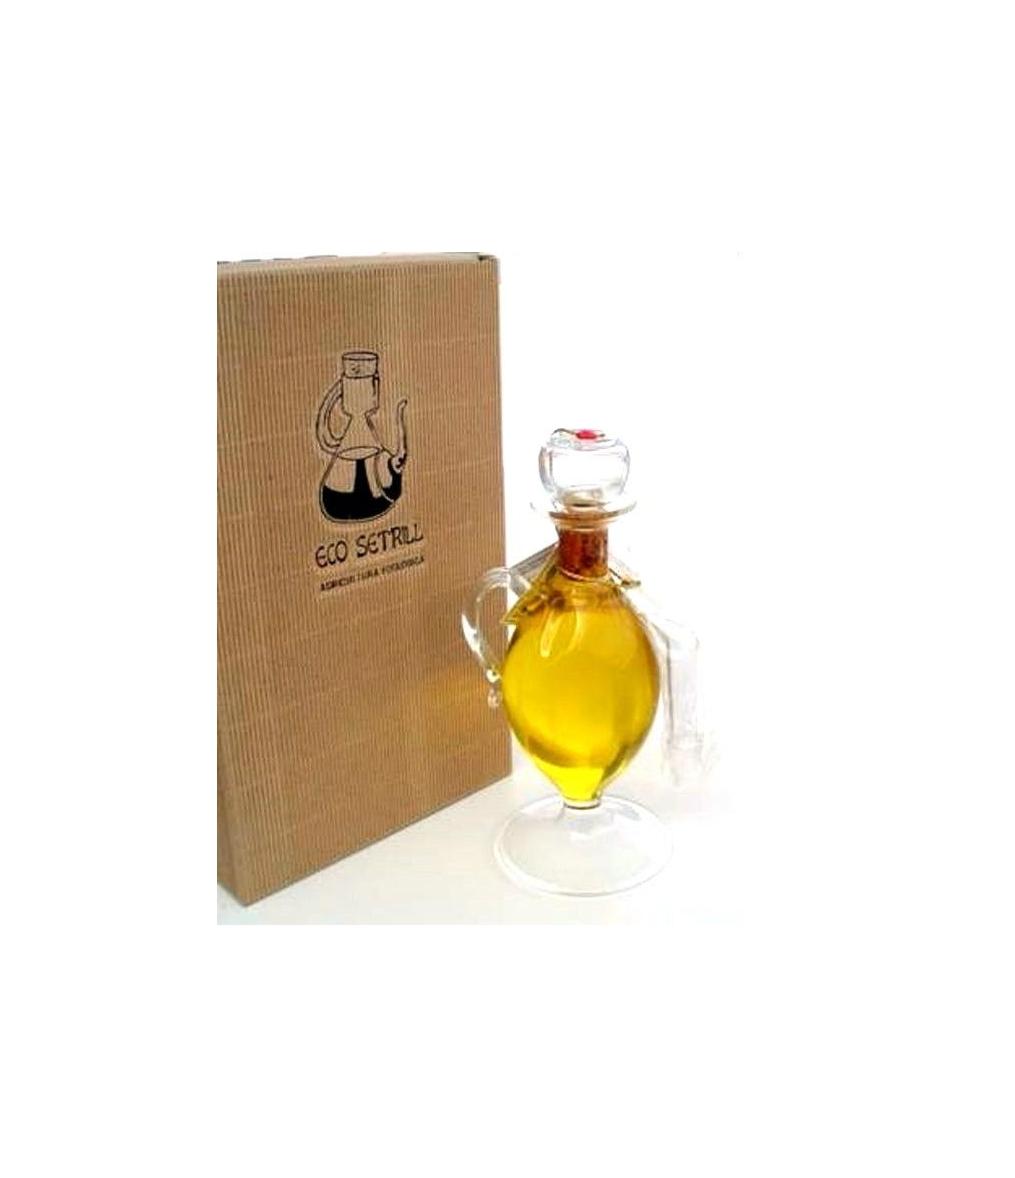 Huile de gel eco setrill huilier en verre 250 ml for Gel a depolir le verre